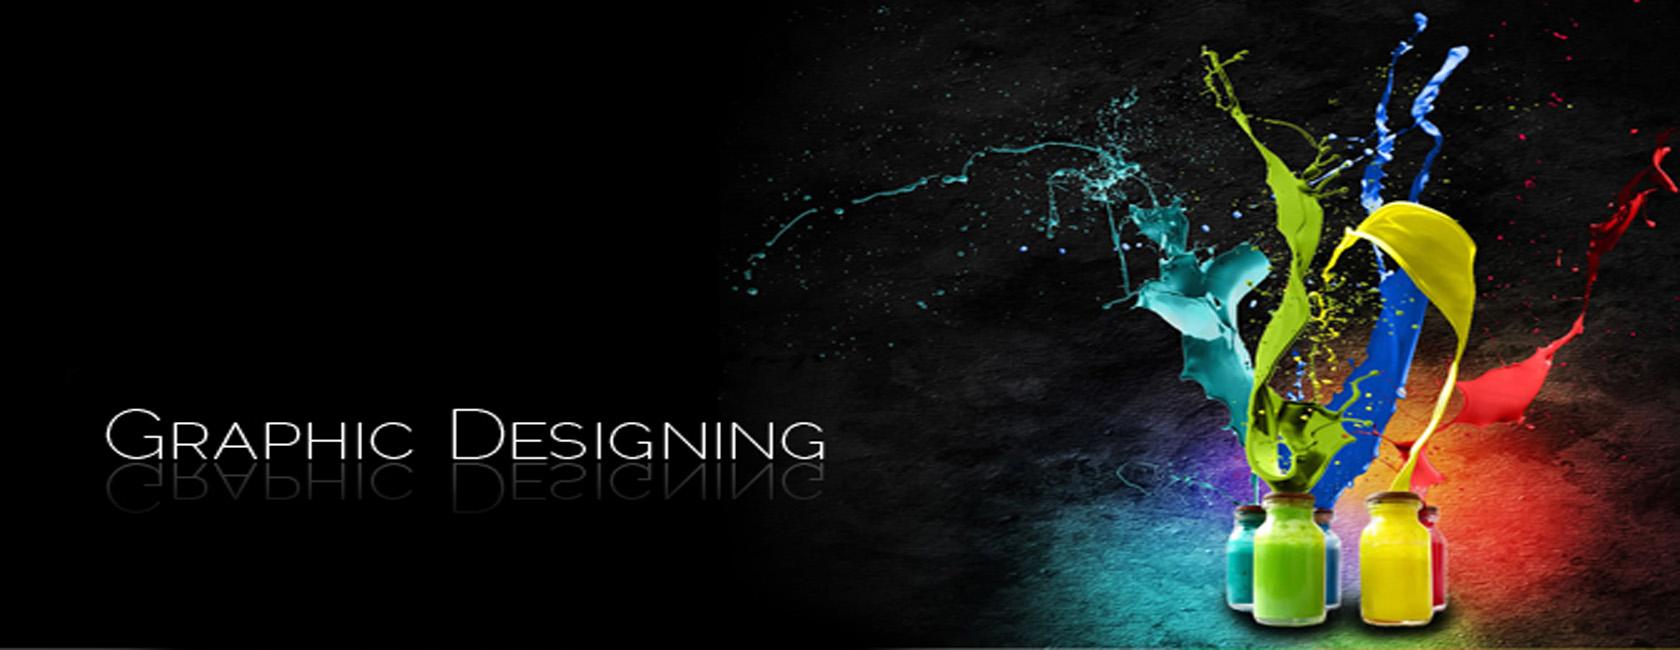 graphics-design-bg1